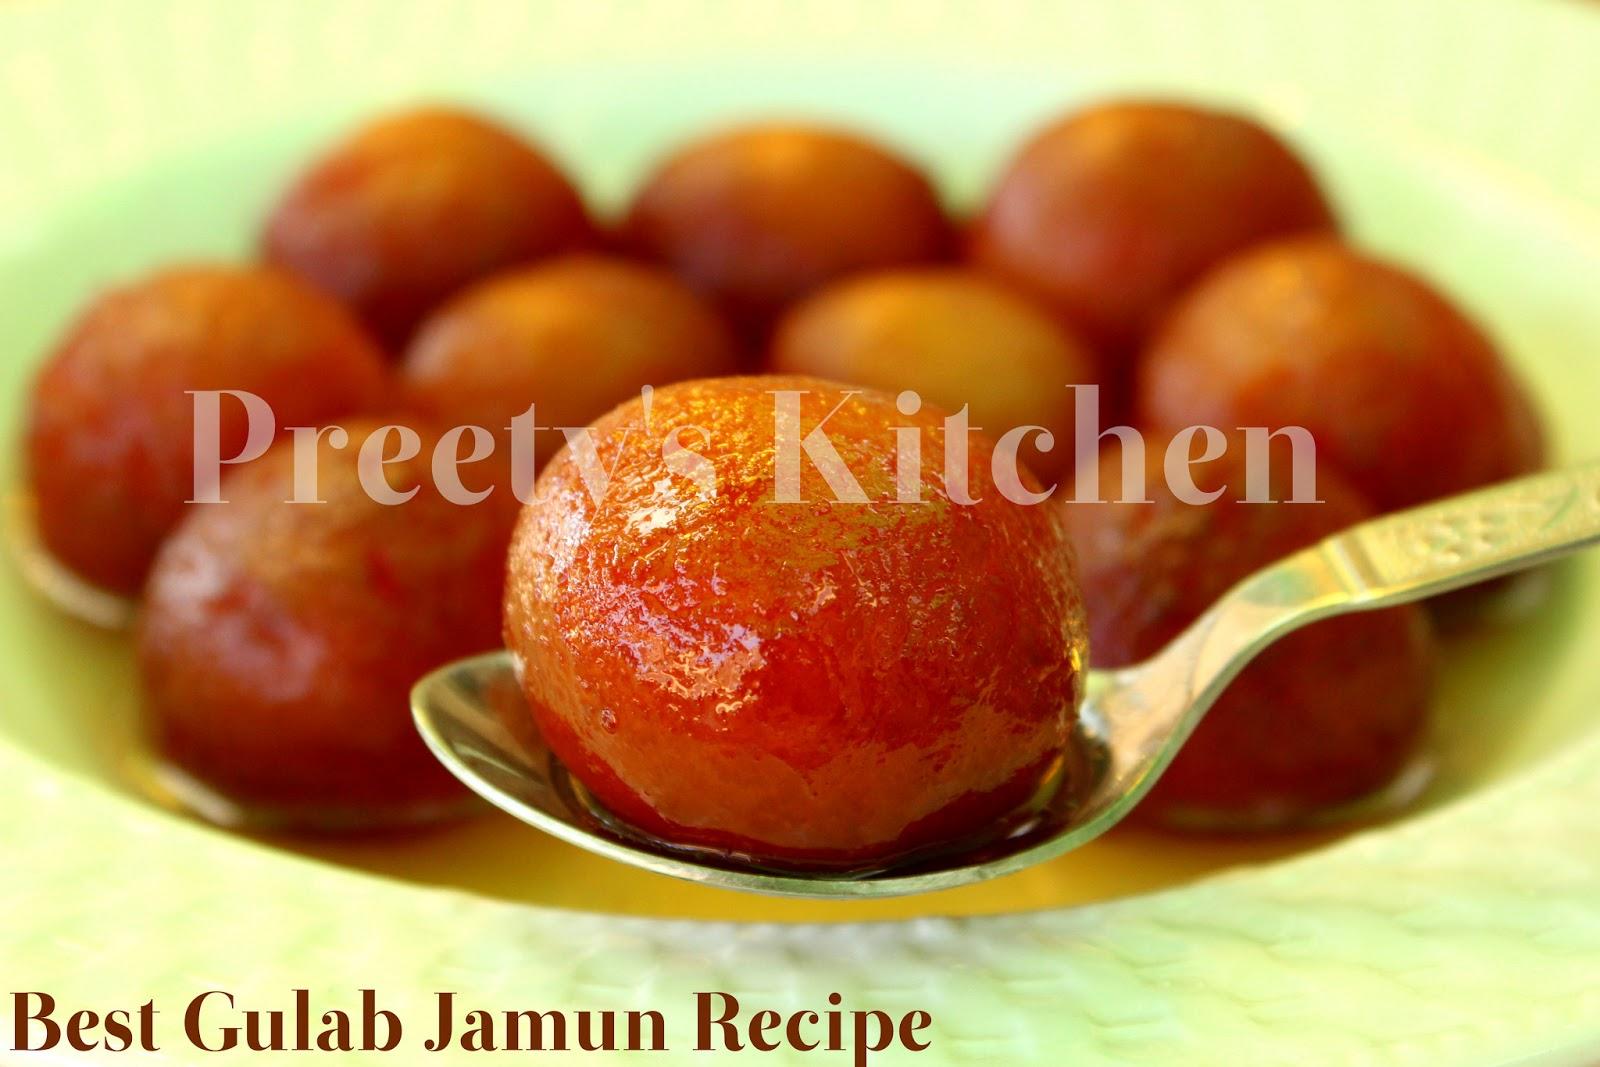 how to make gulab jamun recipe in tamil